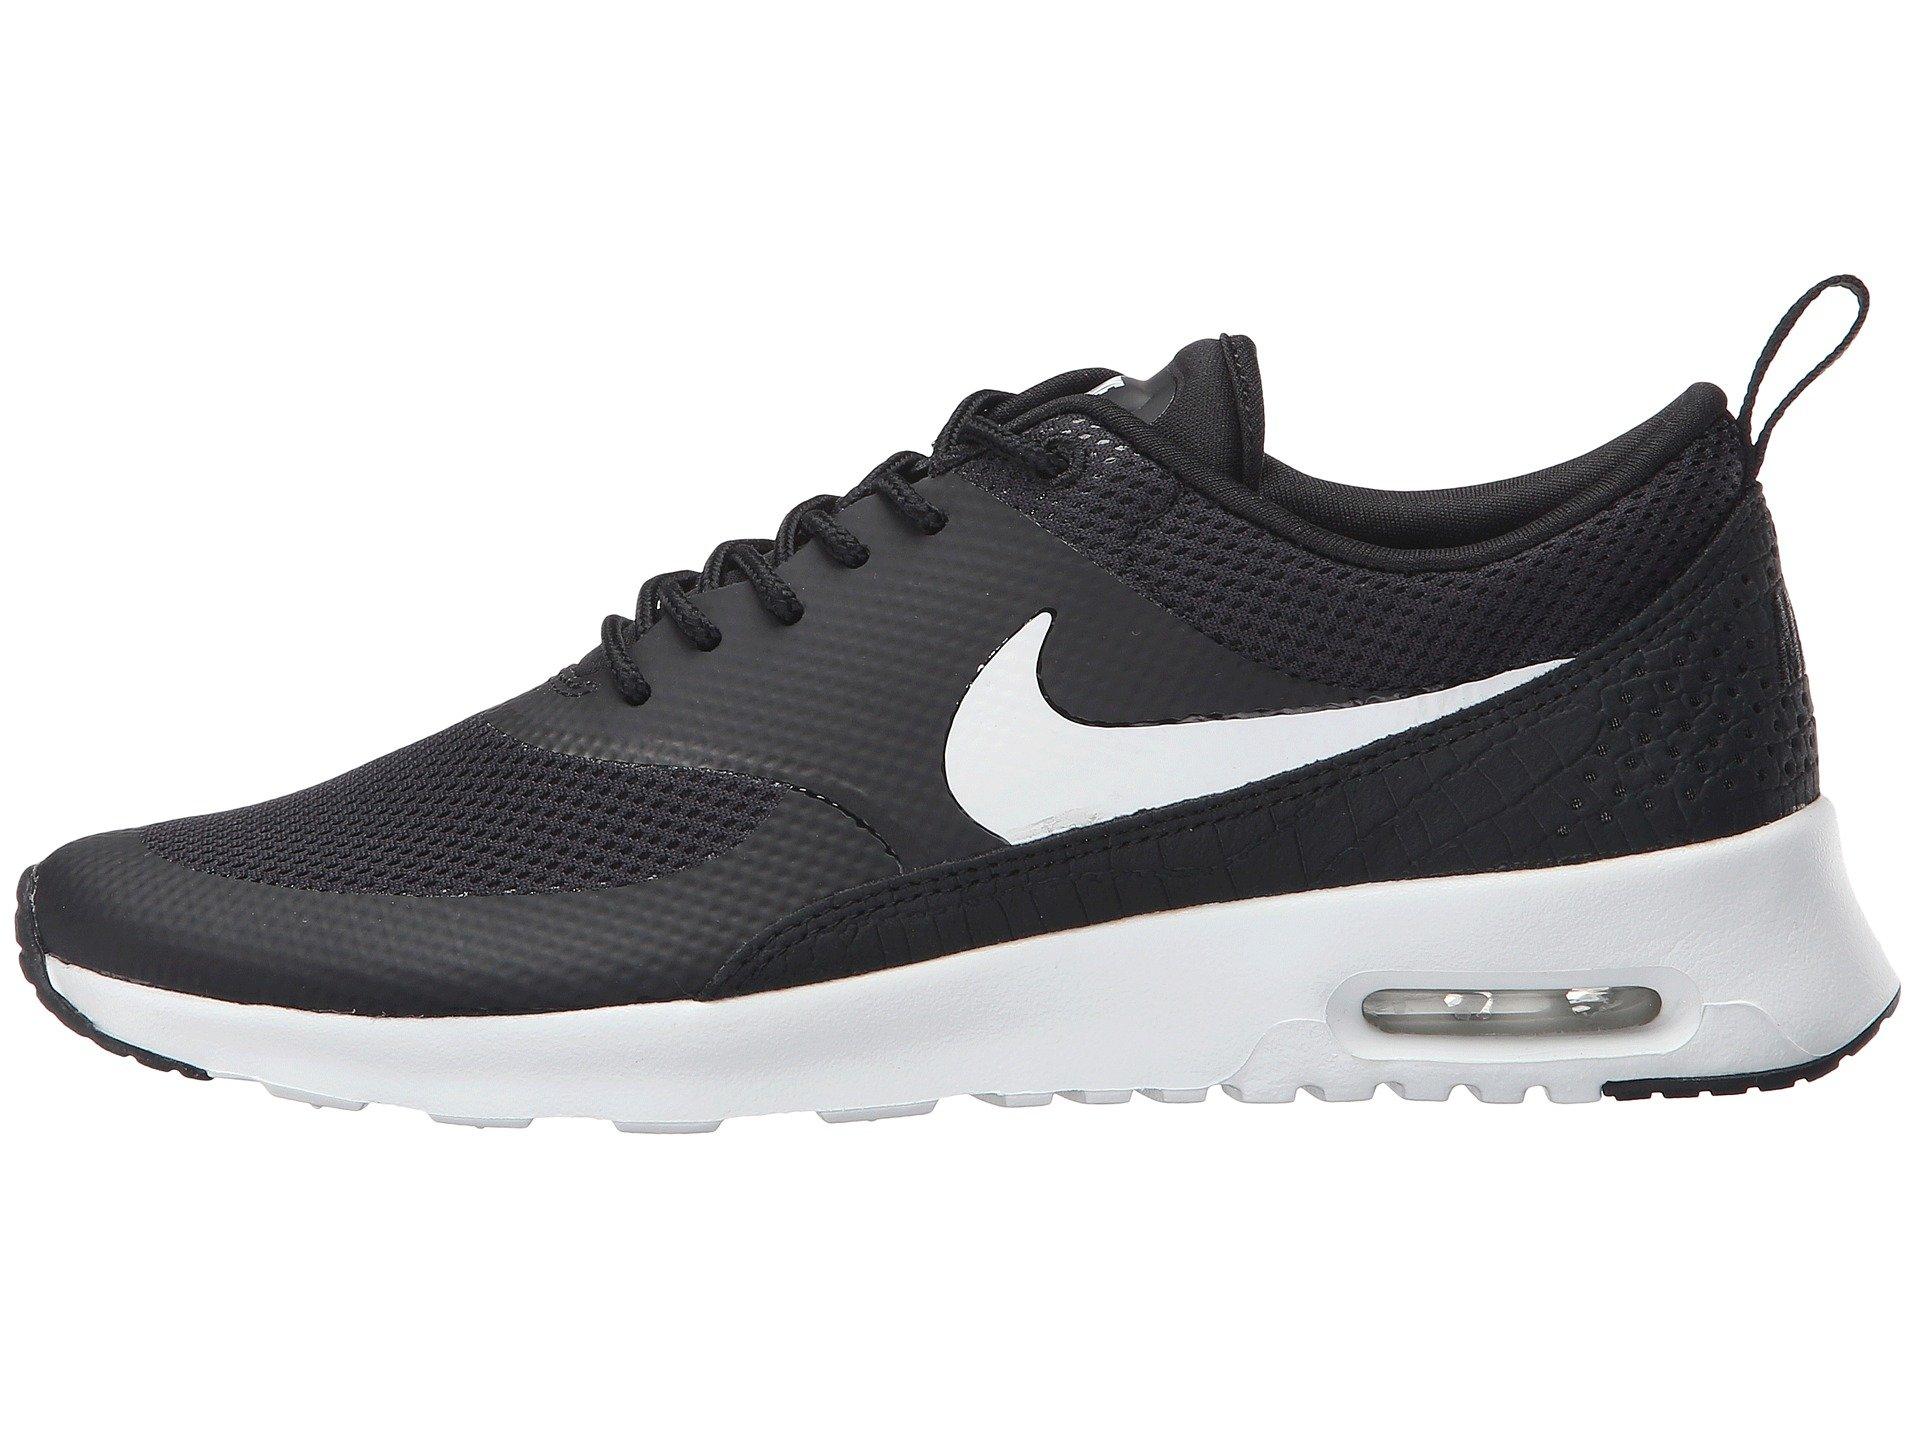 Big Girls Nike Air Max Thea Platinum Mesh Classic Black And White ... 8e5fa848e07f